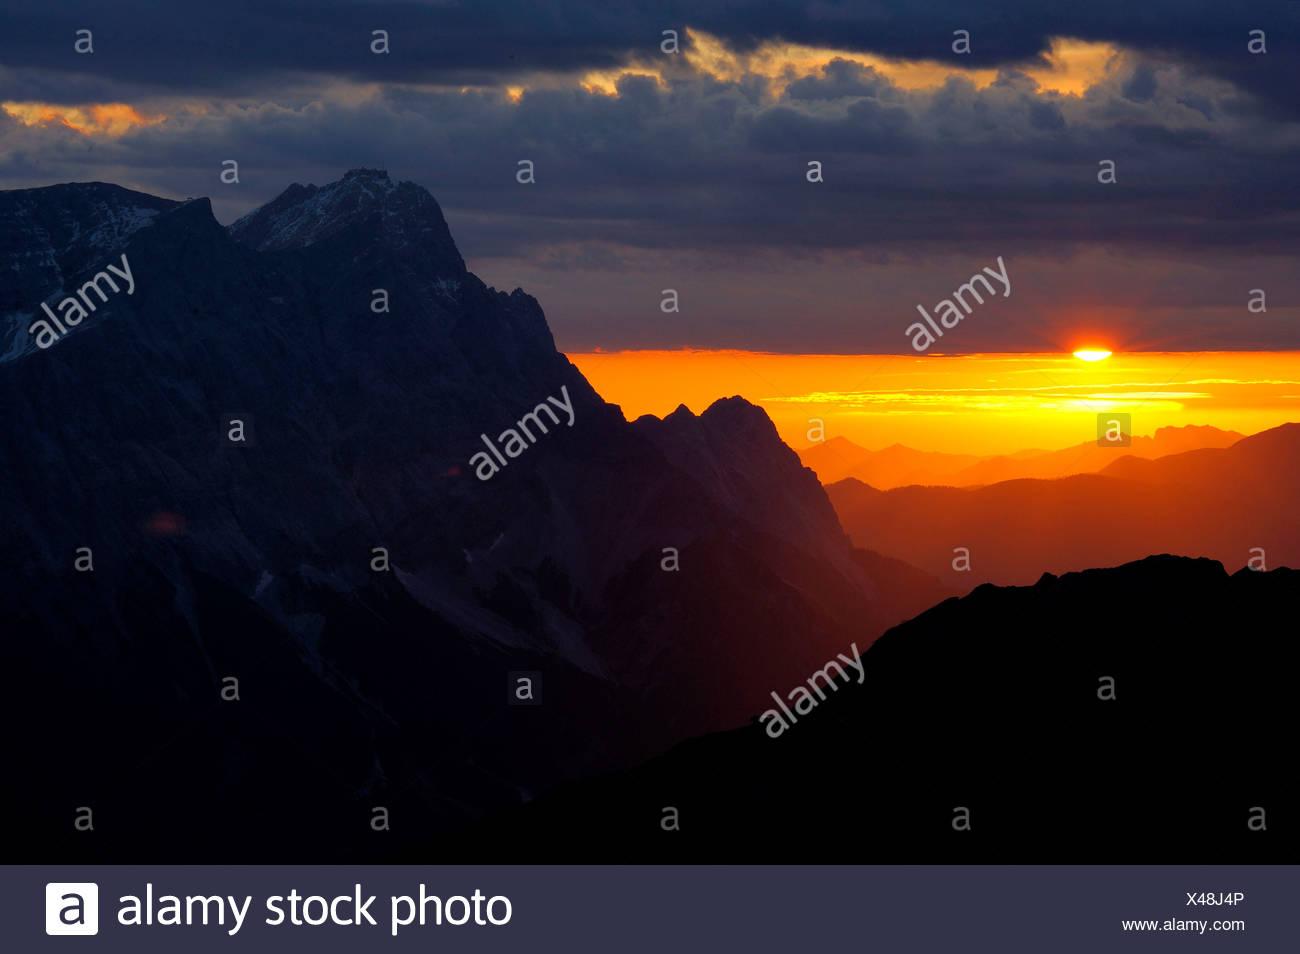 Sunrise behind Zugspitze Mountain with staggered mountain peaks, Berwang, Ausserfern, Tyrol, Austria, Europe - Stock Image